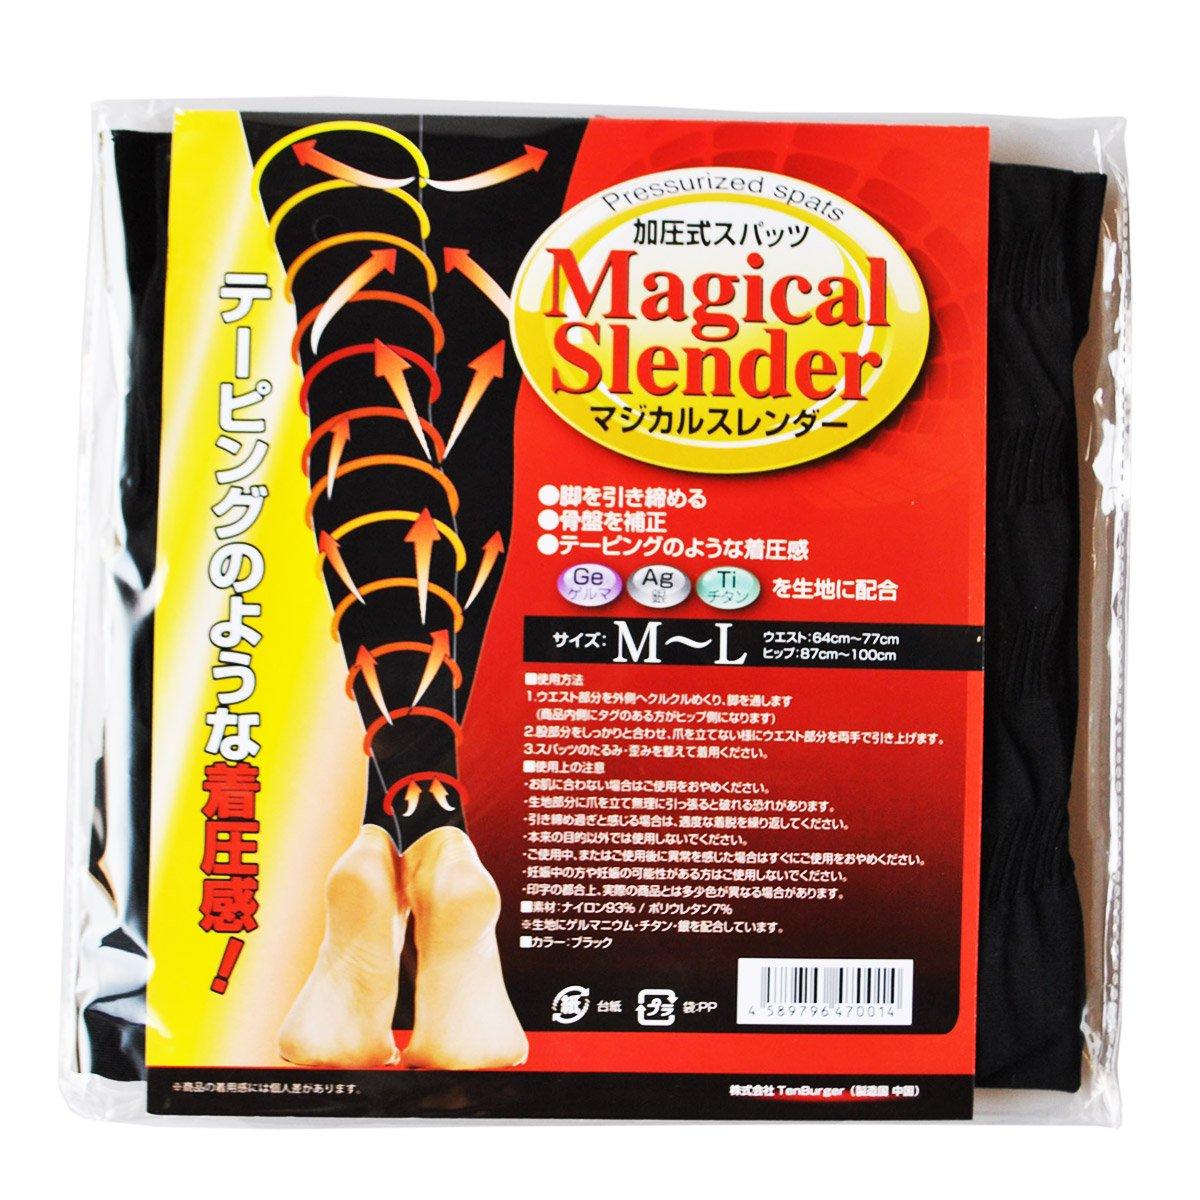 Ten Burger Magical Slender (マジカルスレンダー) (M-Lサイズ) 加圧 美脚 脚痩せ 骨盤矯正 補正下着 むくみ リンパマッサージ スパッツ Ten Burger